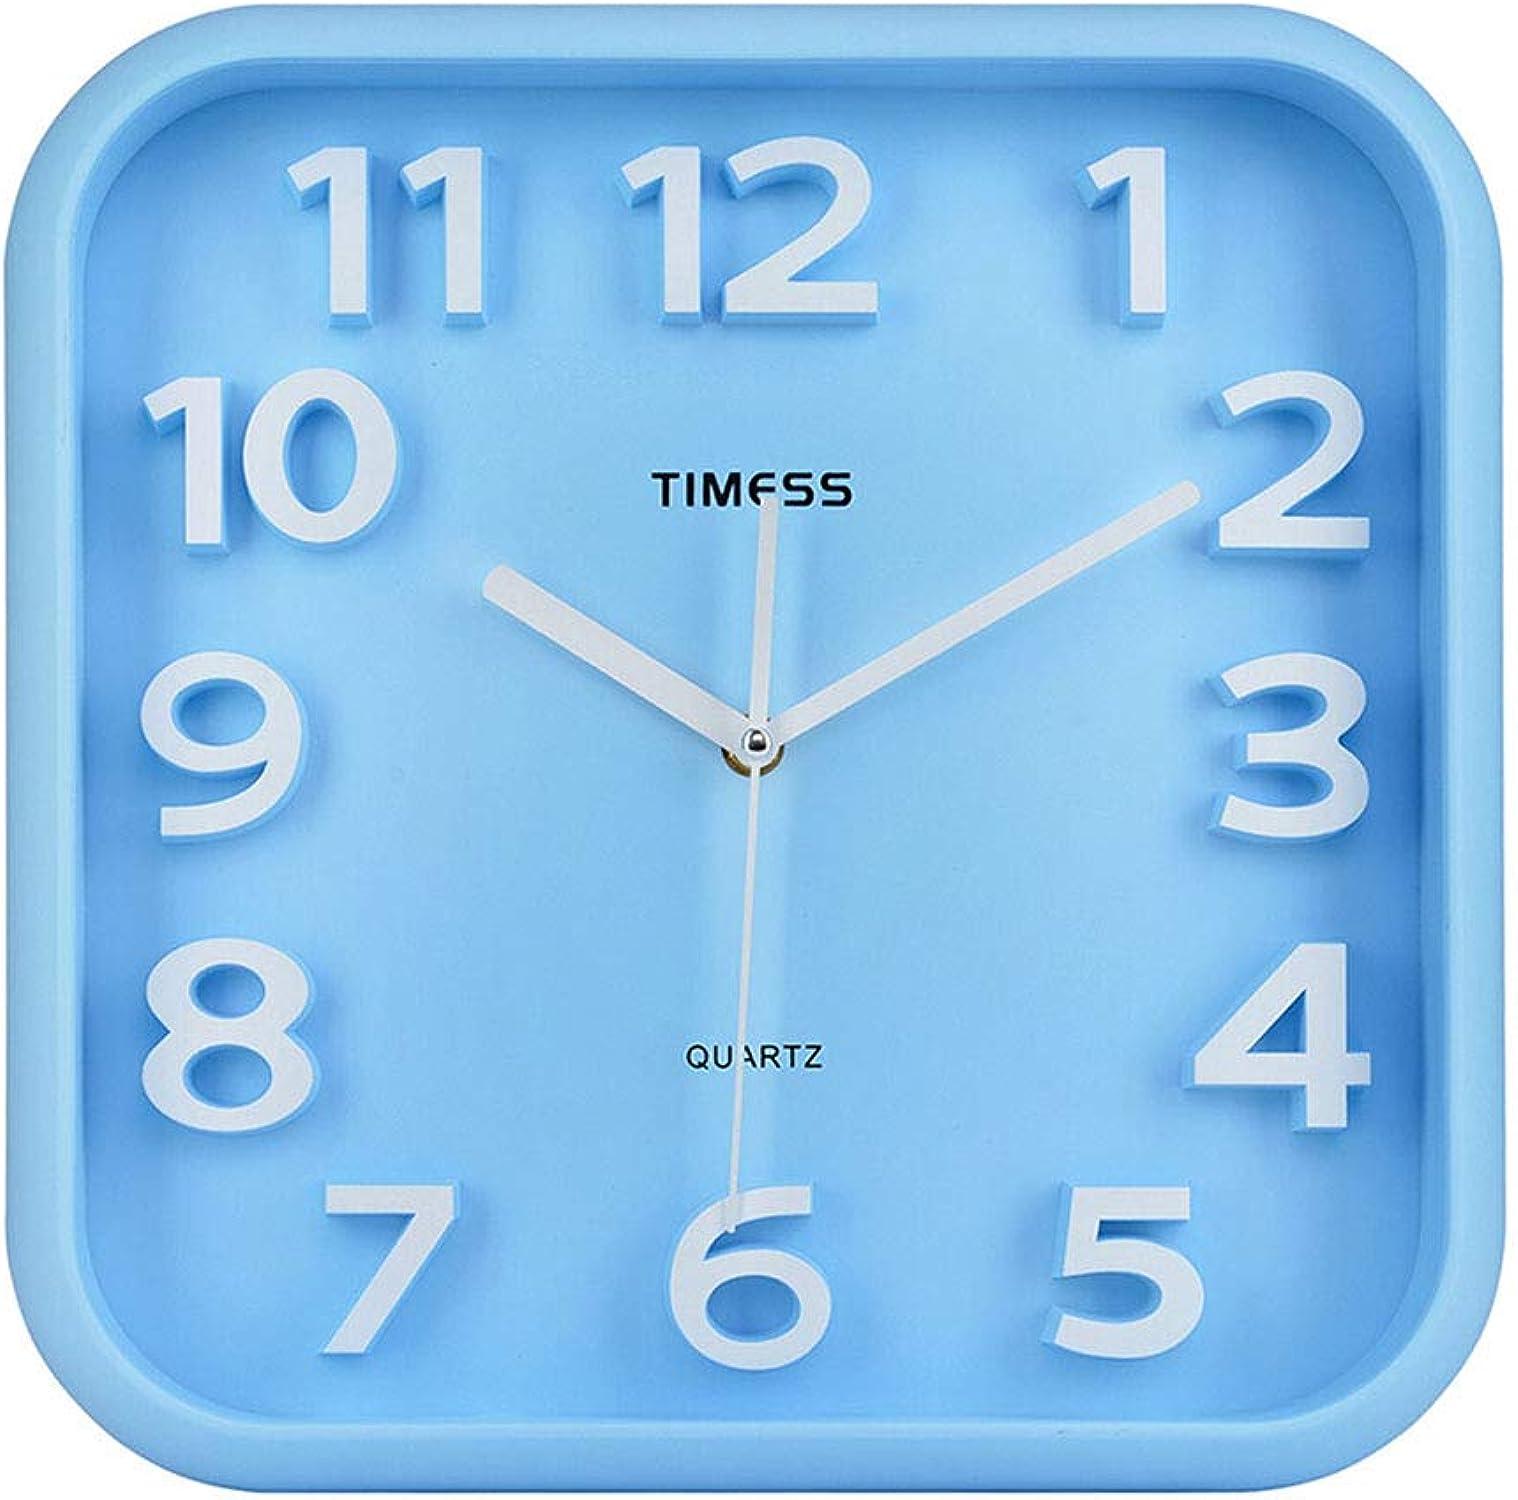 Hlia-Clocks Reloj de Parojo de 13 Pulgadas, Moda Simple, estéreo 3D, Creativo, Sala de Estar, Mesa, Dormitorio, Reloj de Cuarzo silencioso (Color   Azul)